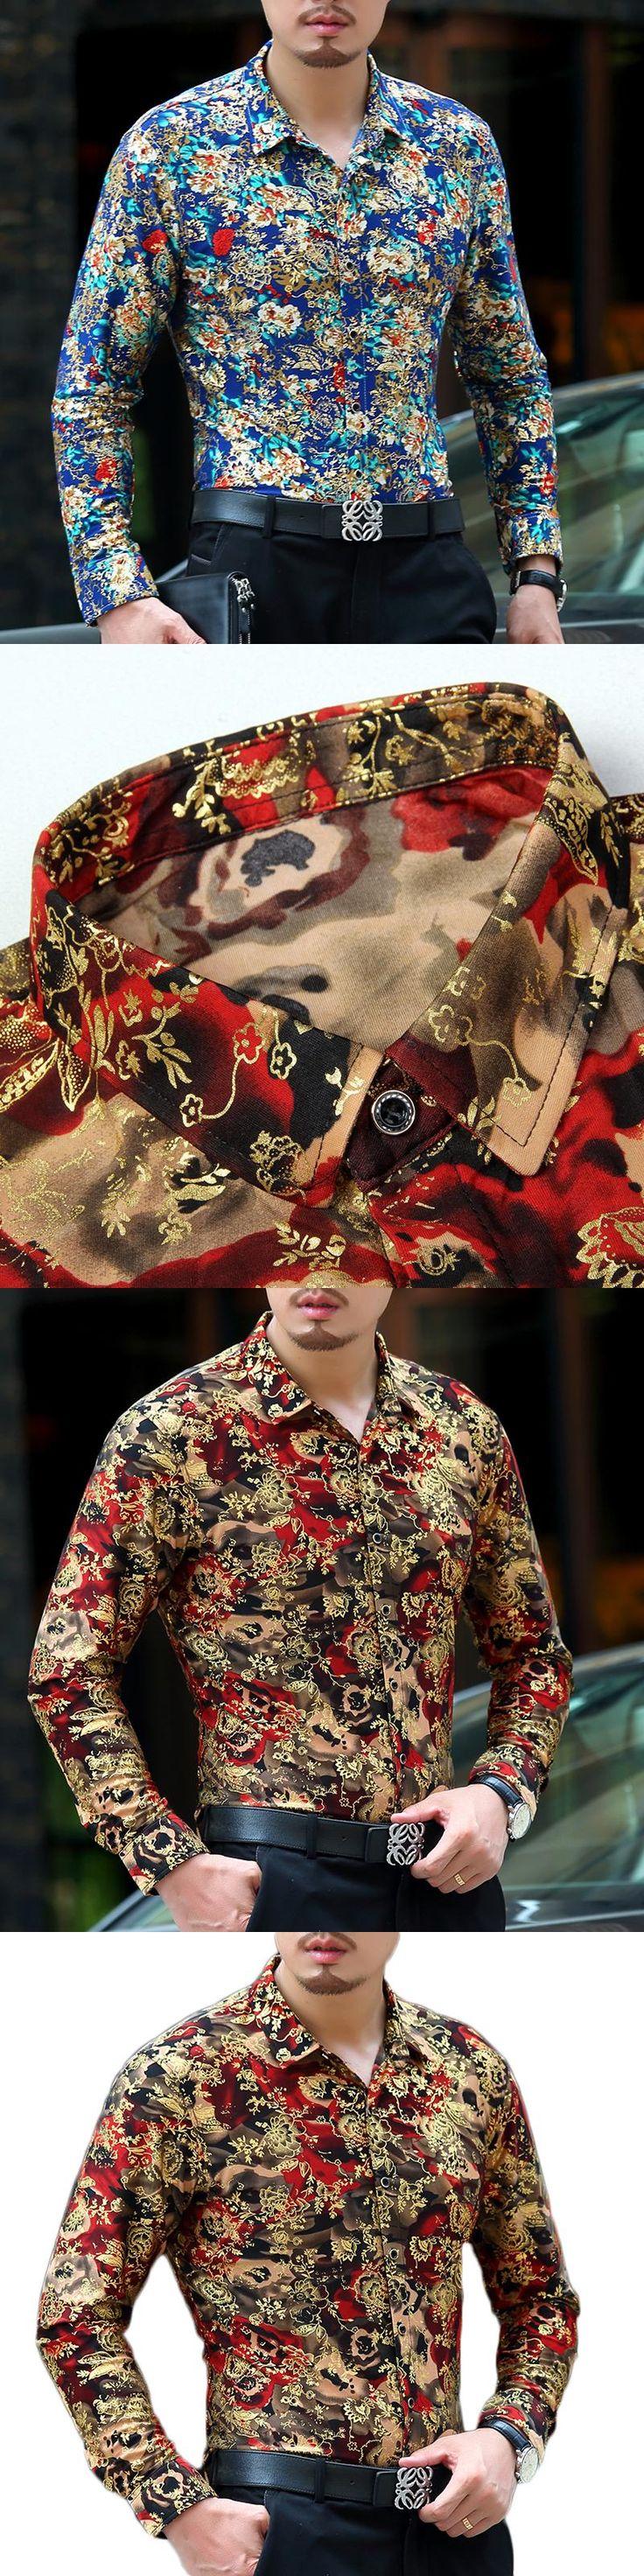 2017 Luxury Shirts Mens Floral Printed Baroque Shirts Mens Silk Shirts Velvet Camisa Slim Fit Chemise Homme Social Club Dresses